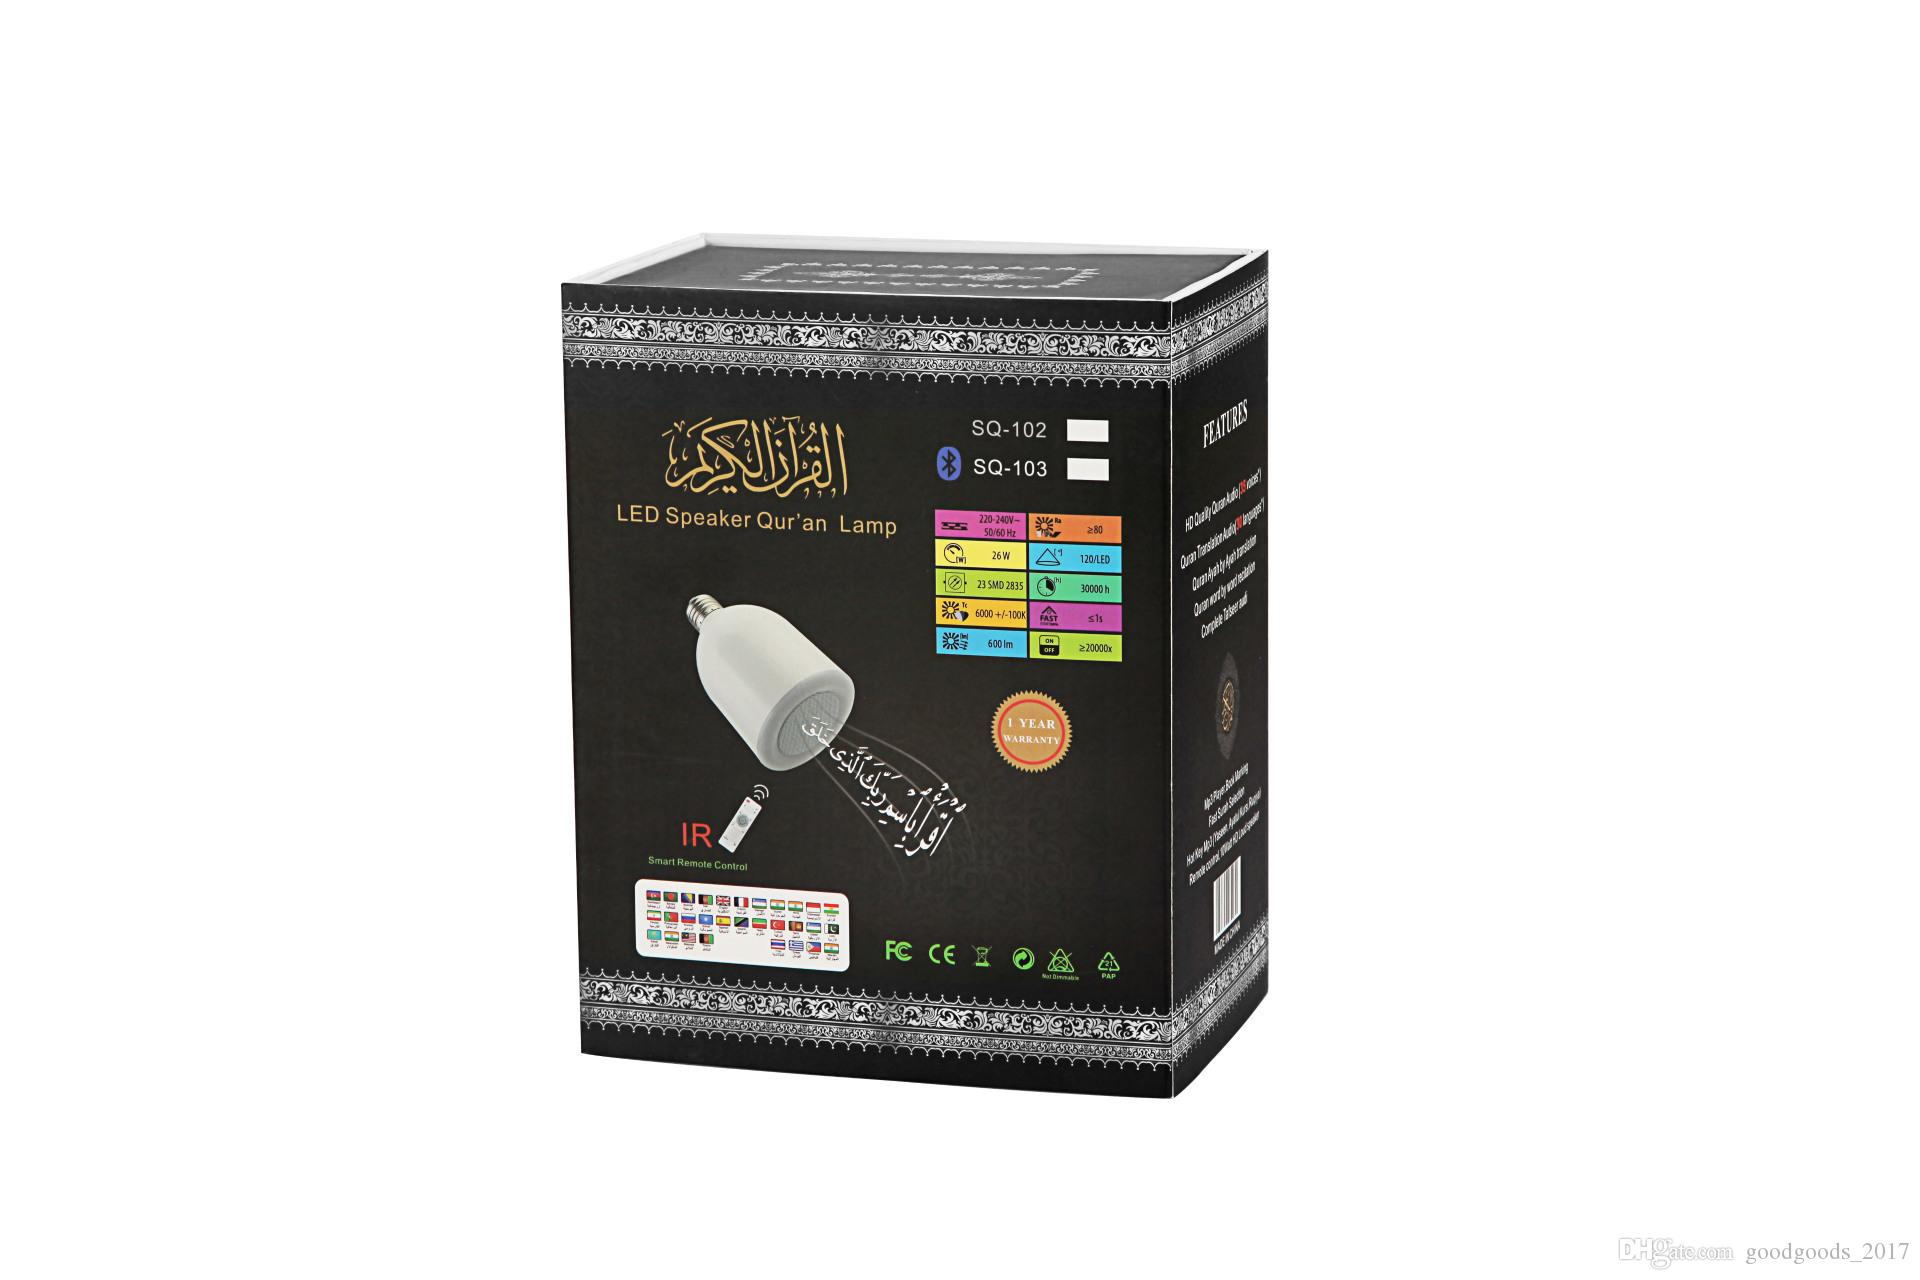 Ages Speakers K264 E27 Lamp Arabic All Quran Coran Led Speaker Sq103 Of Light O0vmNnw8